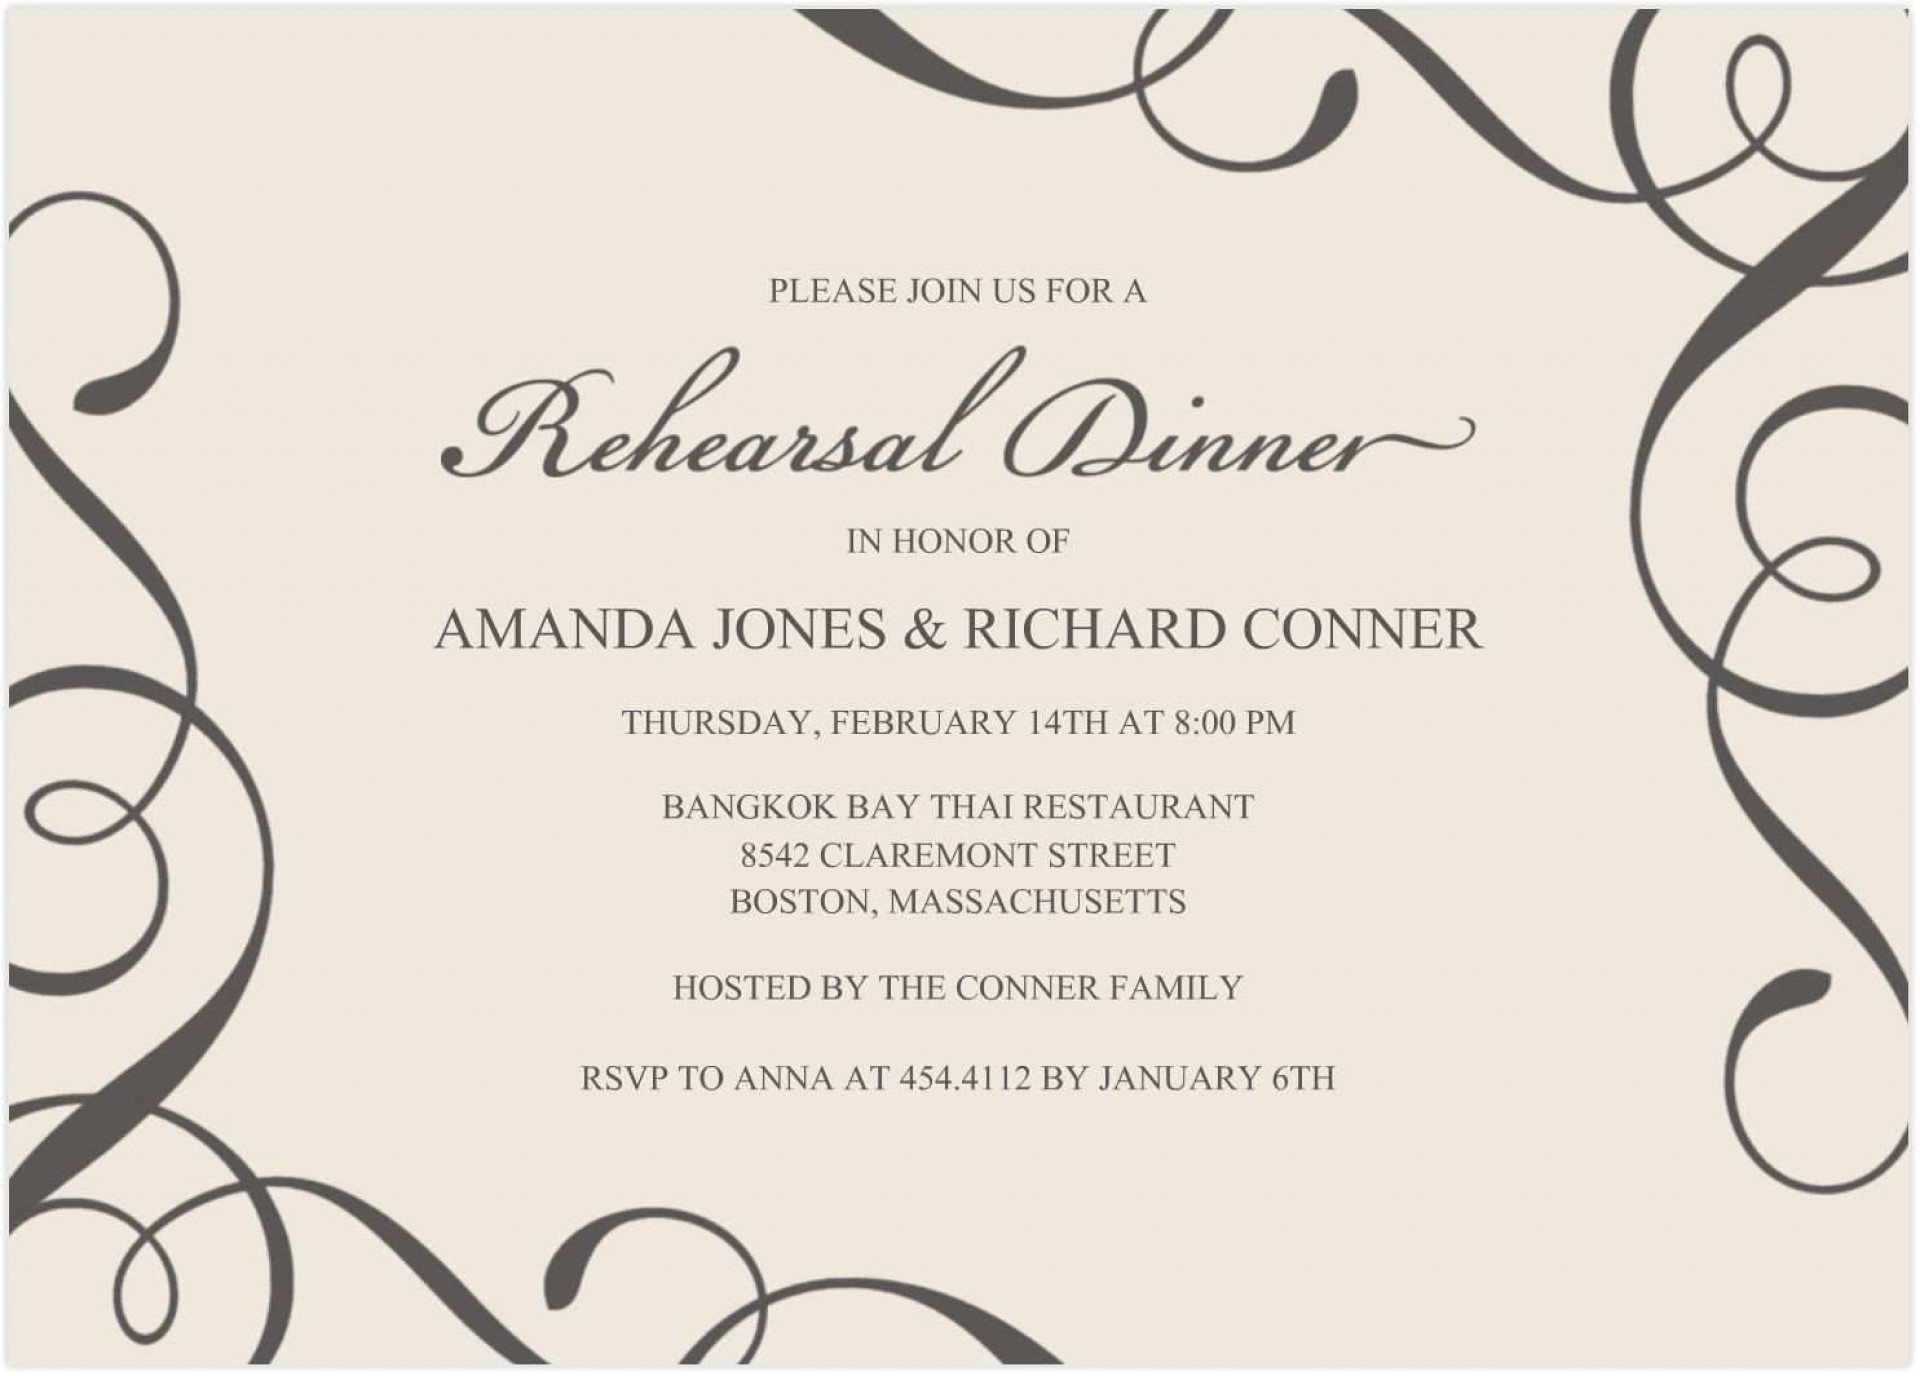 002 Unusual Free Dinner Invitation Template Picture  Templates Rehearsal Printable Italian Thanksgiving1920